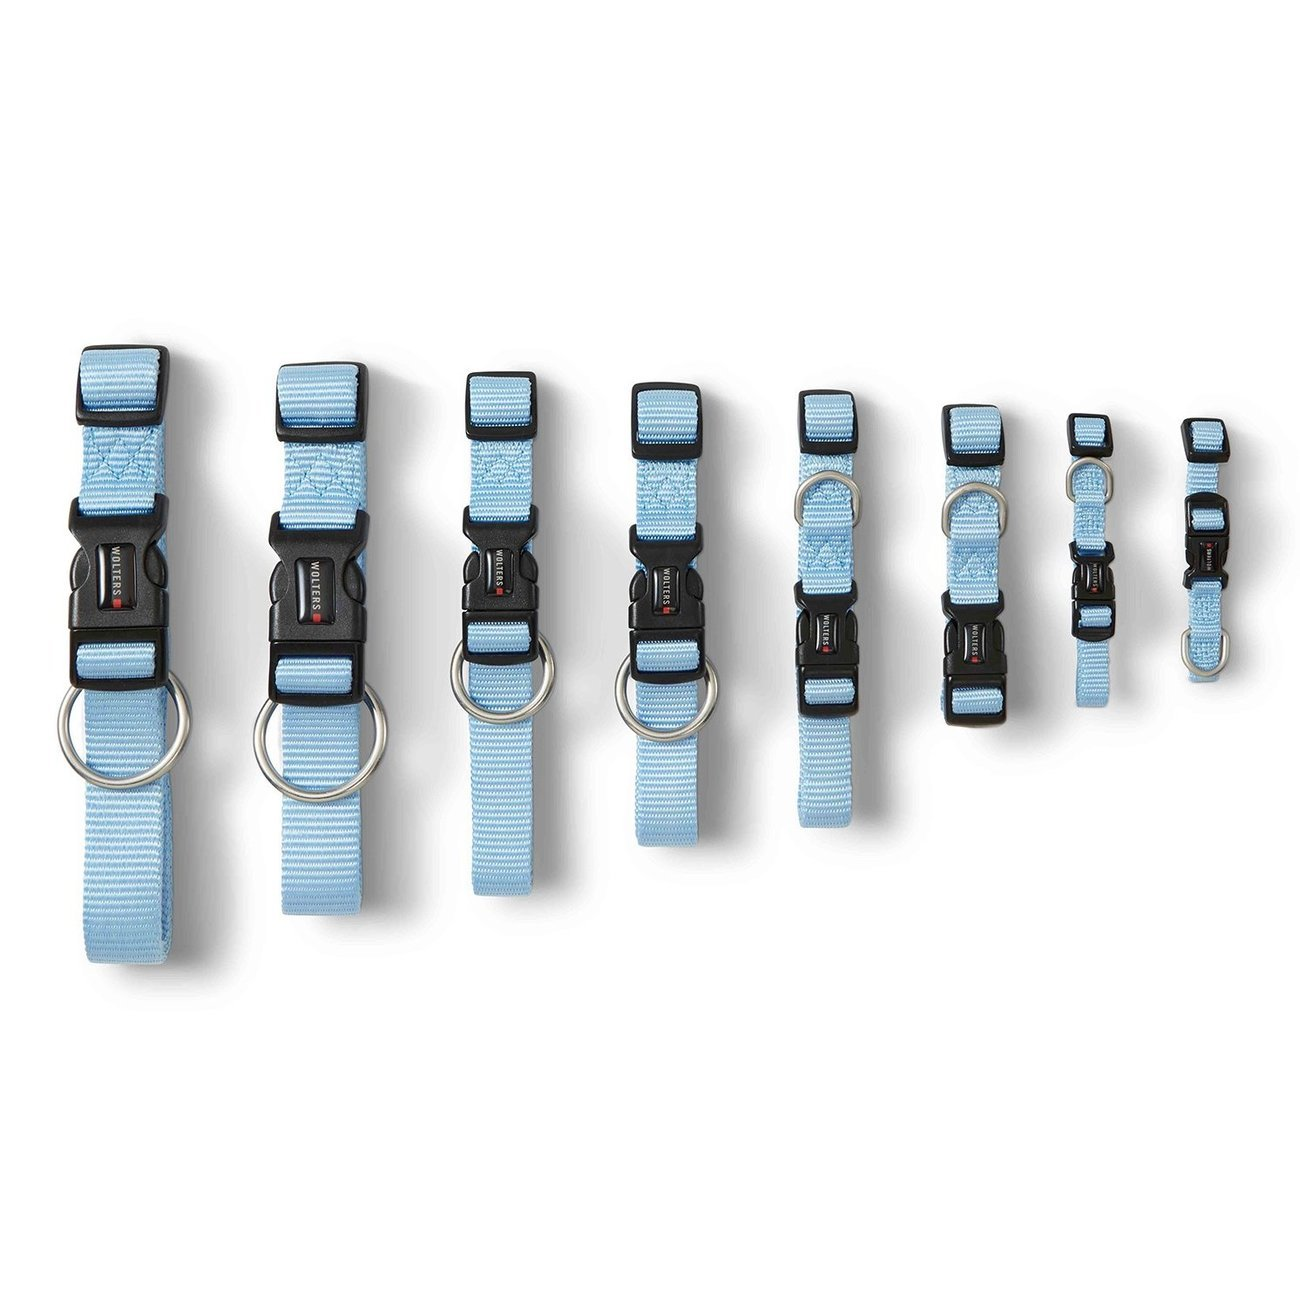 Wolters Halsband Nylon Professional, Bild 4